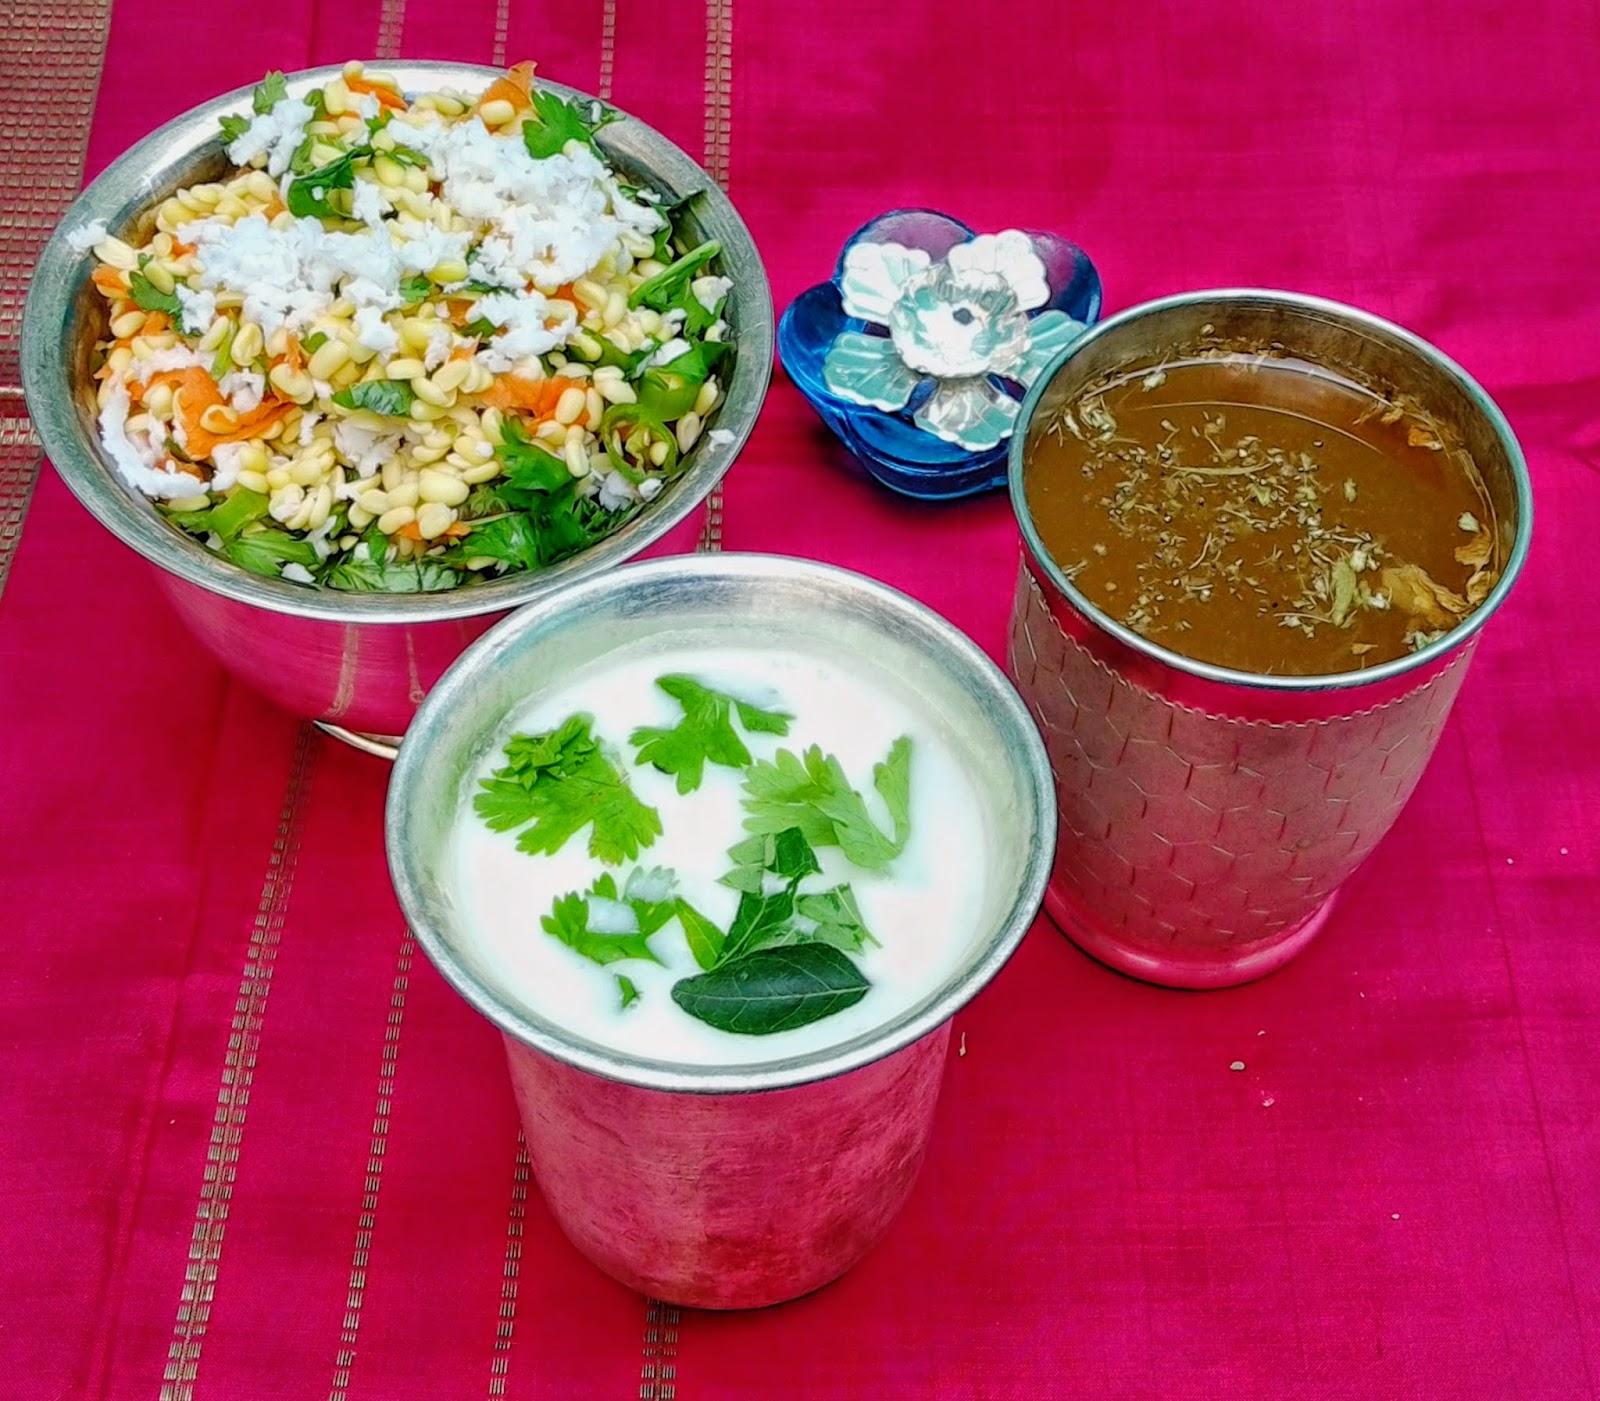 Panagam neermore and kosmalli rama navami recipes bhojana recipes panagam neermore and kosmalli rama navami recipes forumfinder Gallery